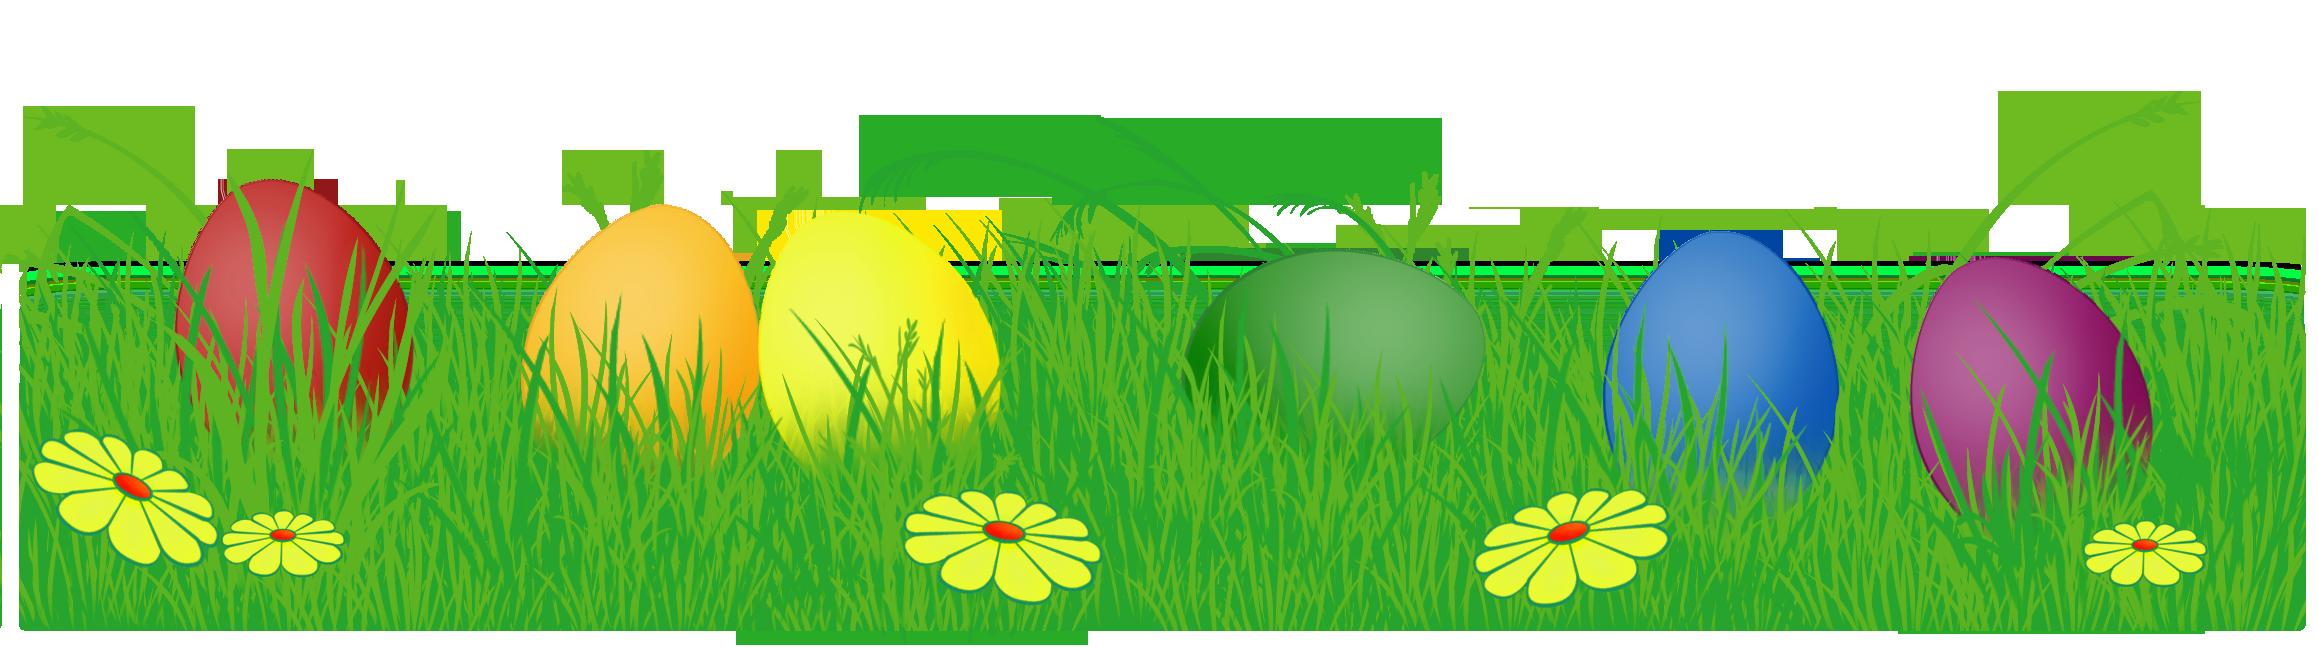 easter bonnet clip art - Google Search   Easter eggs ...